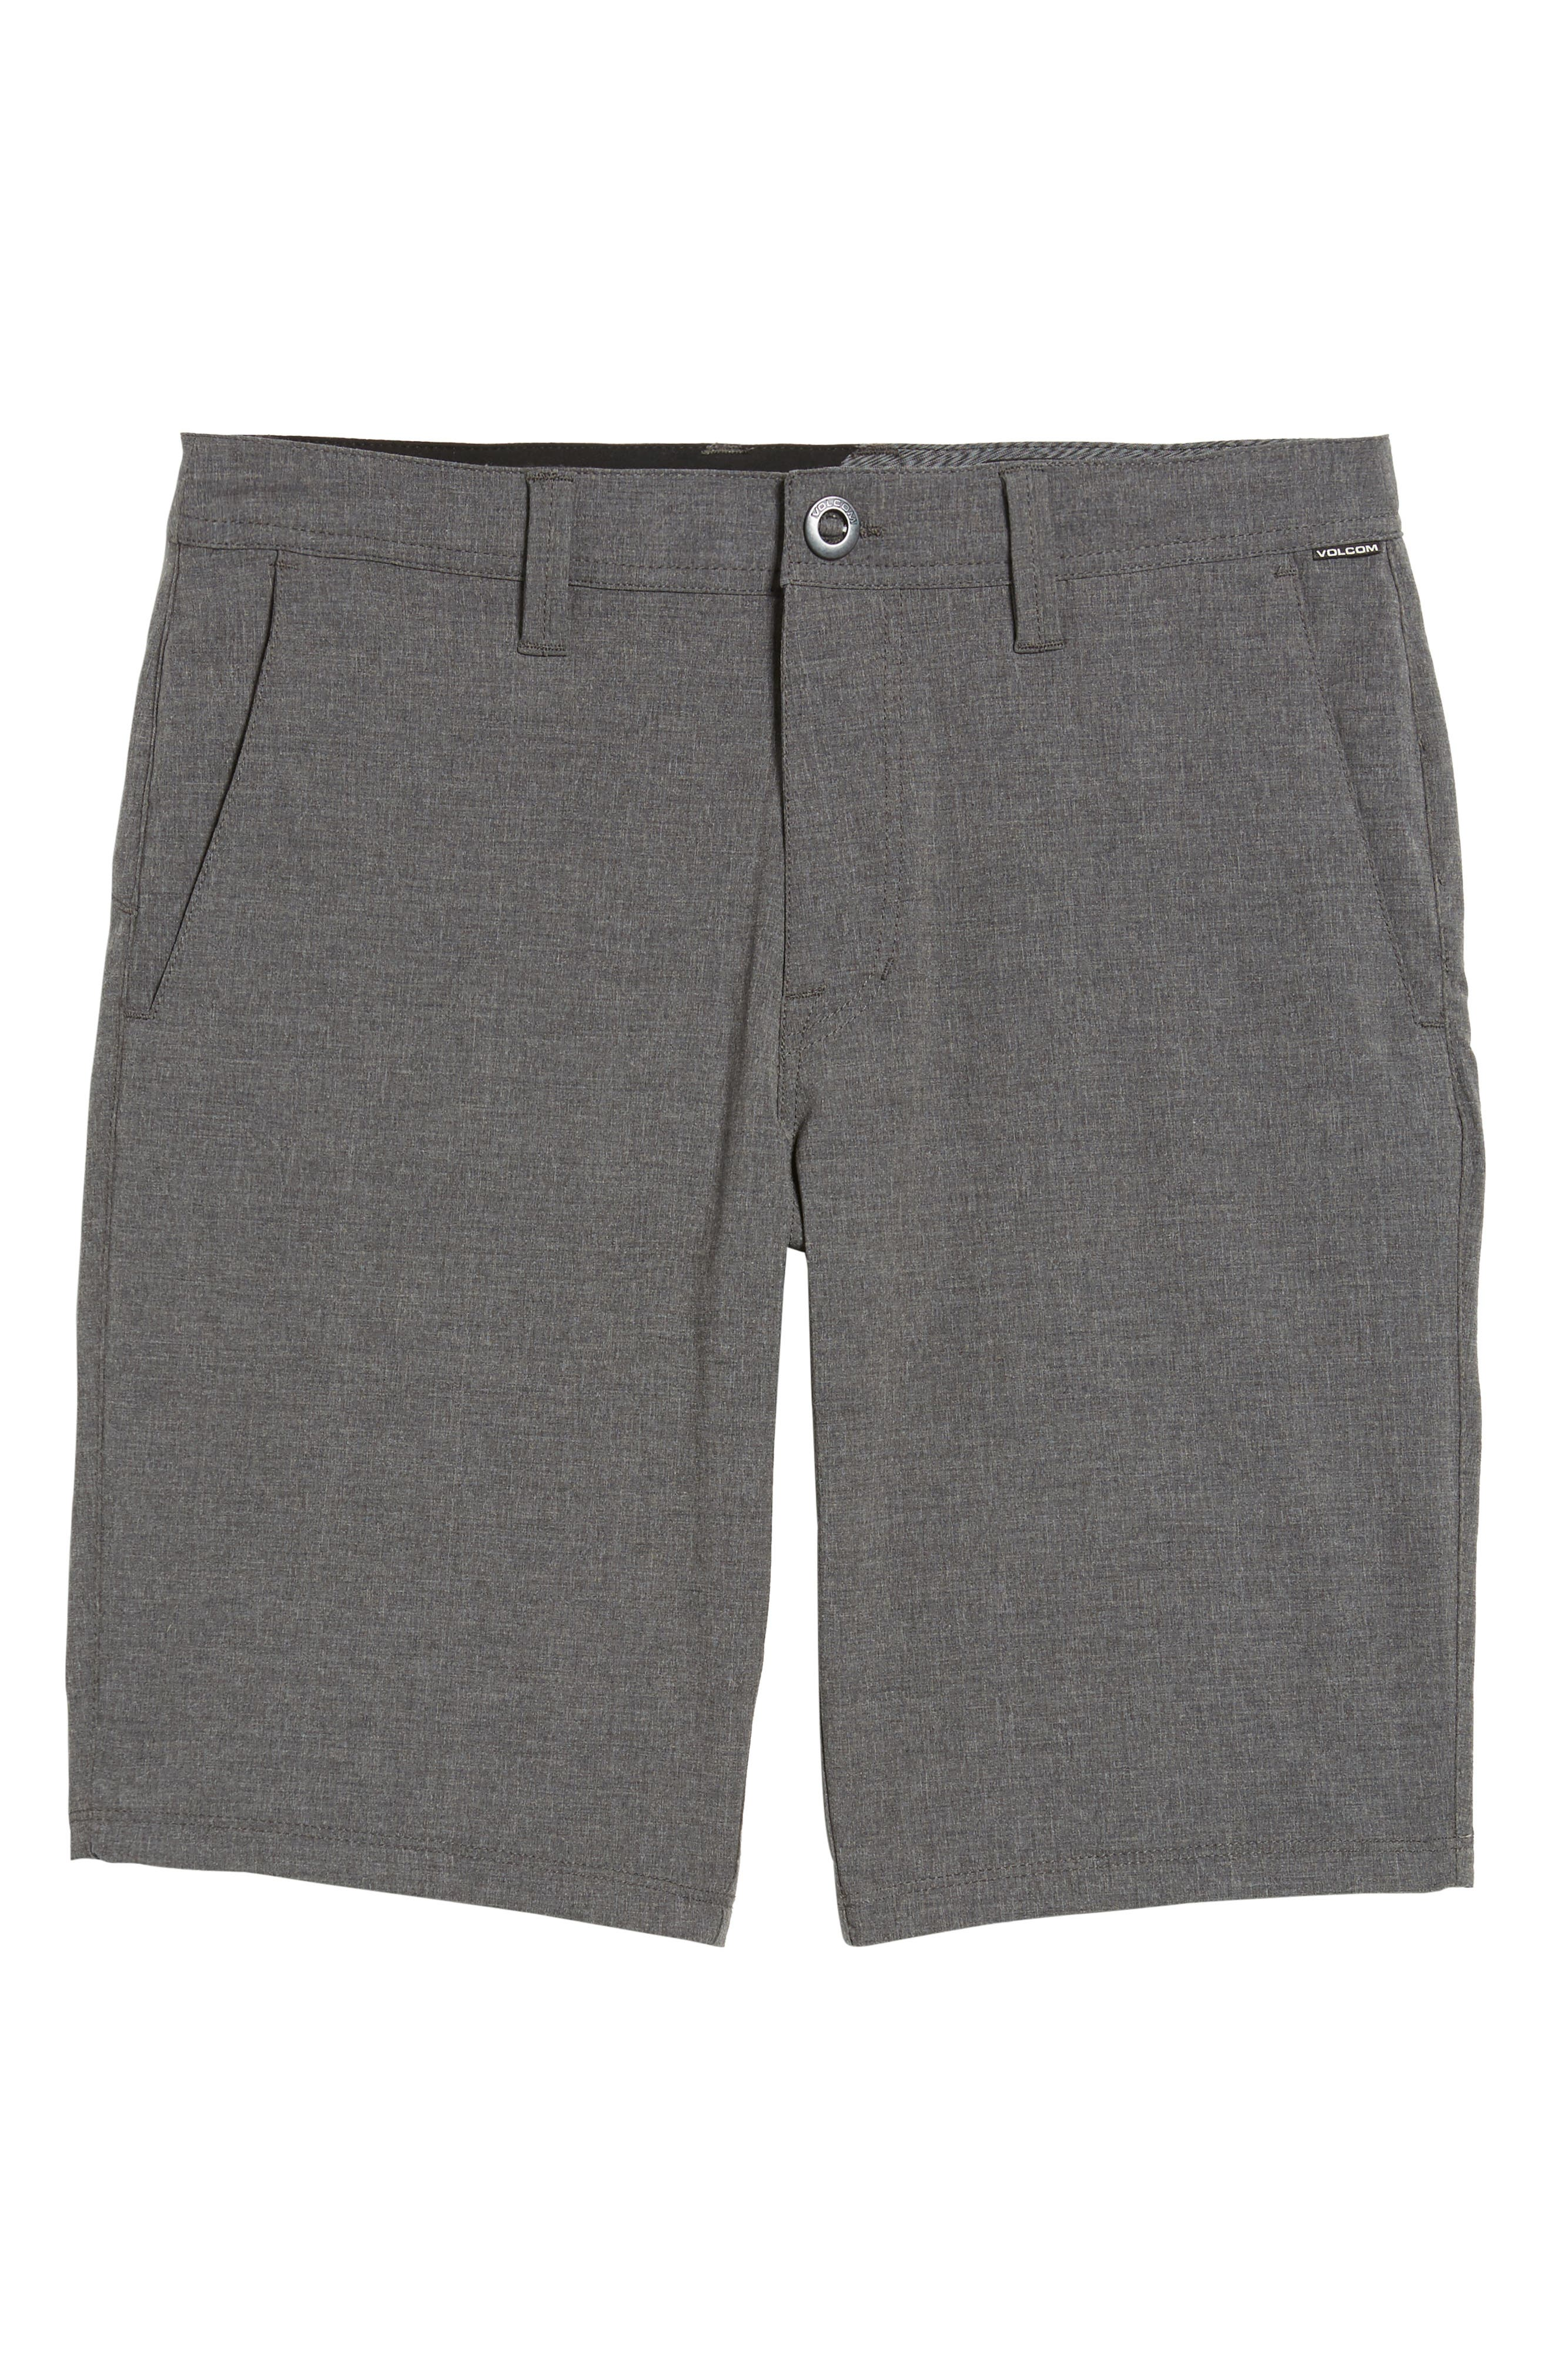 Hybrid Shorts,                             Alternate thumbnail 6, color,                             CHARCOAL